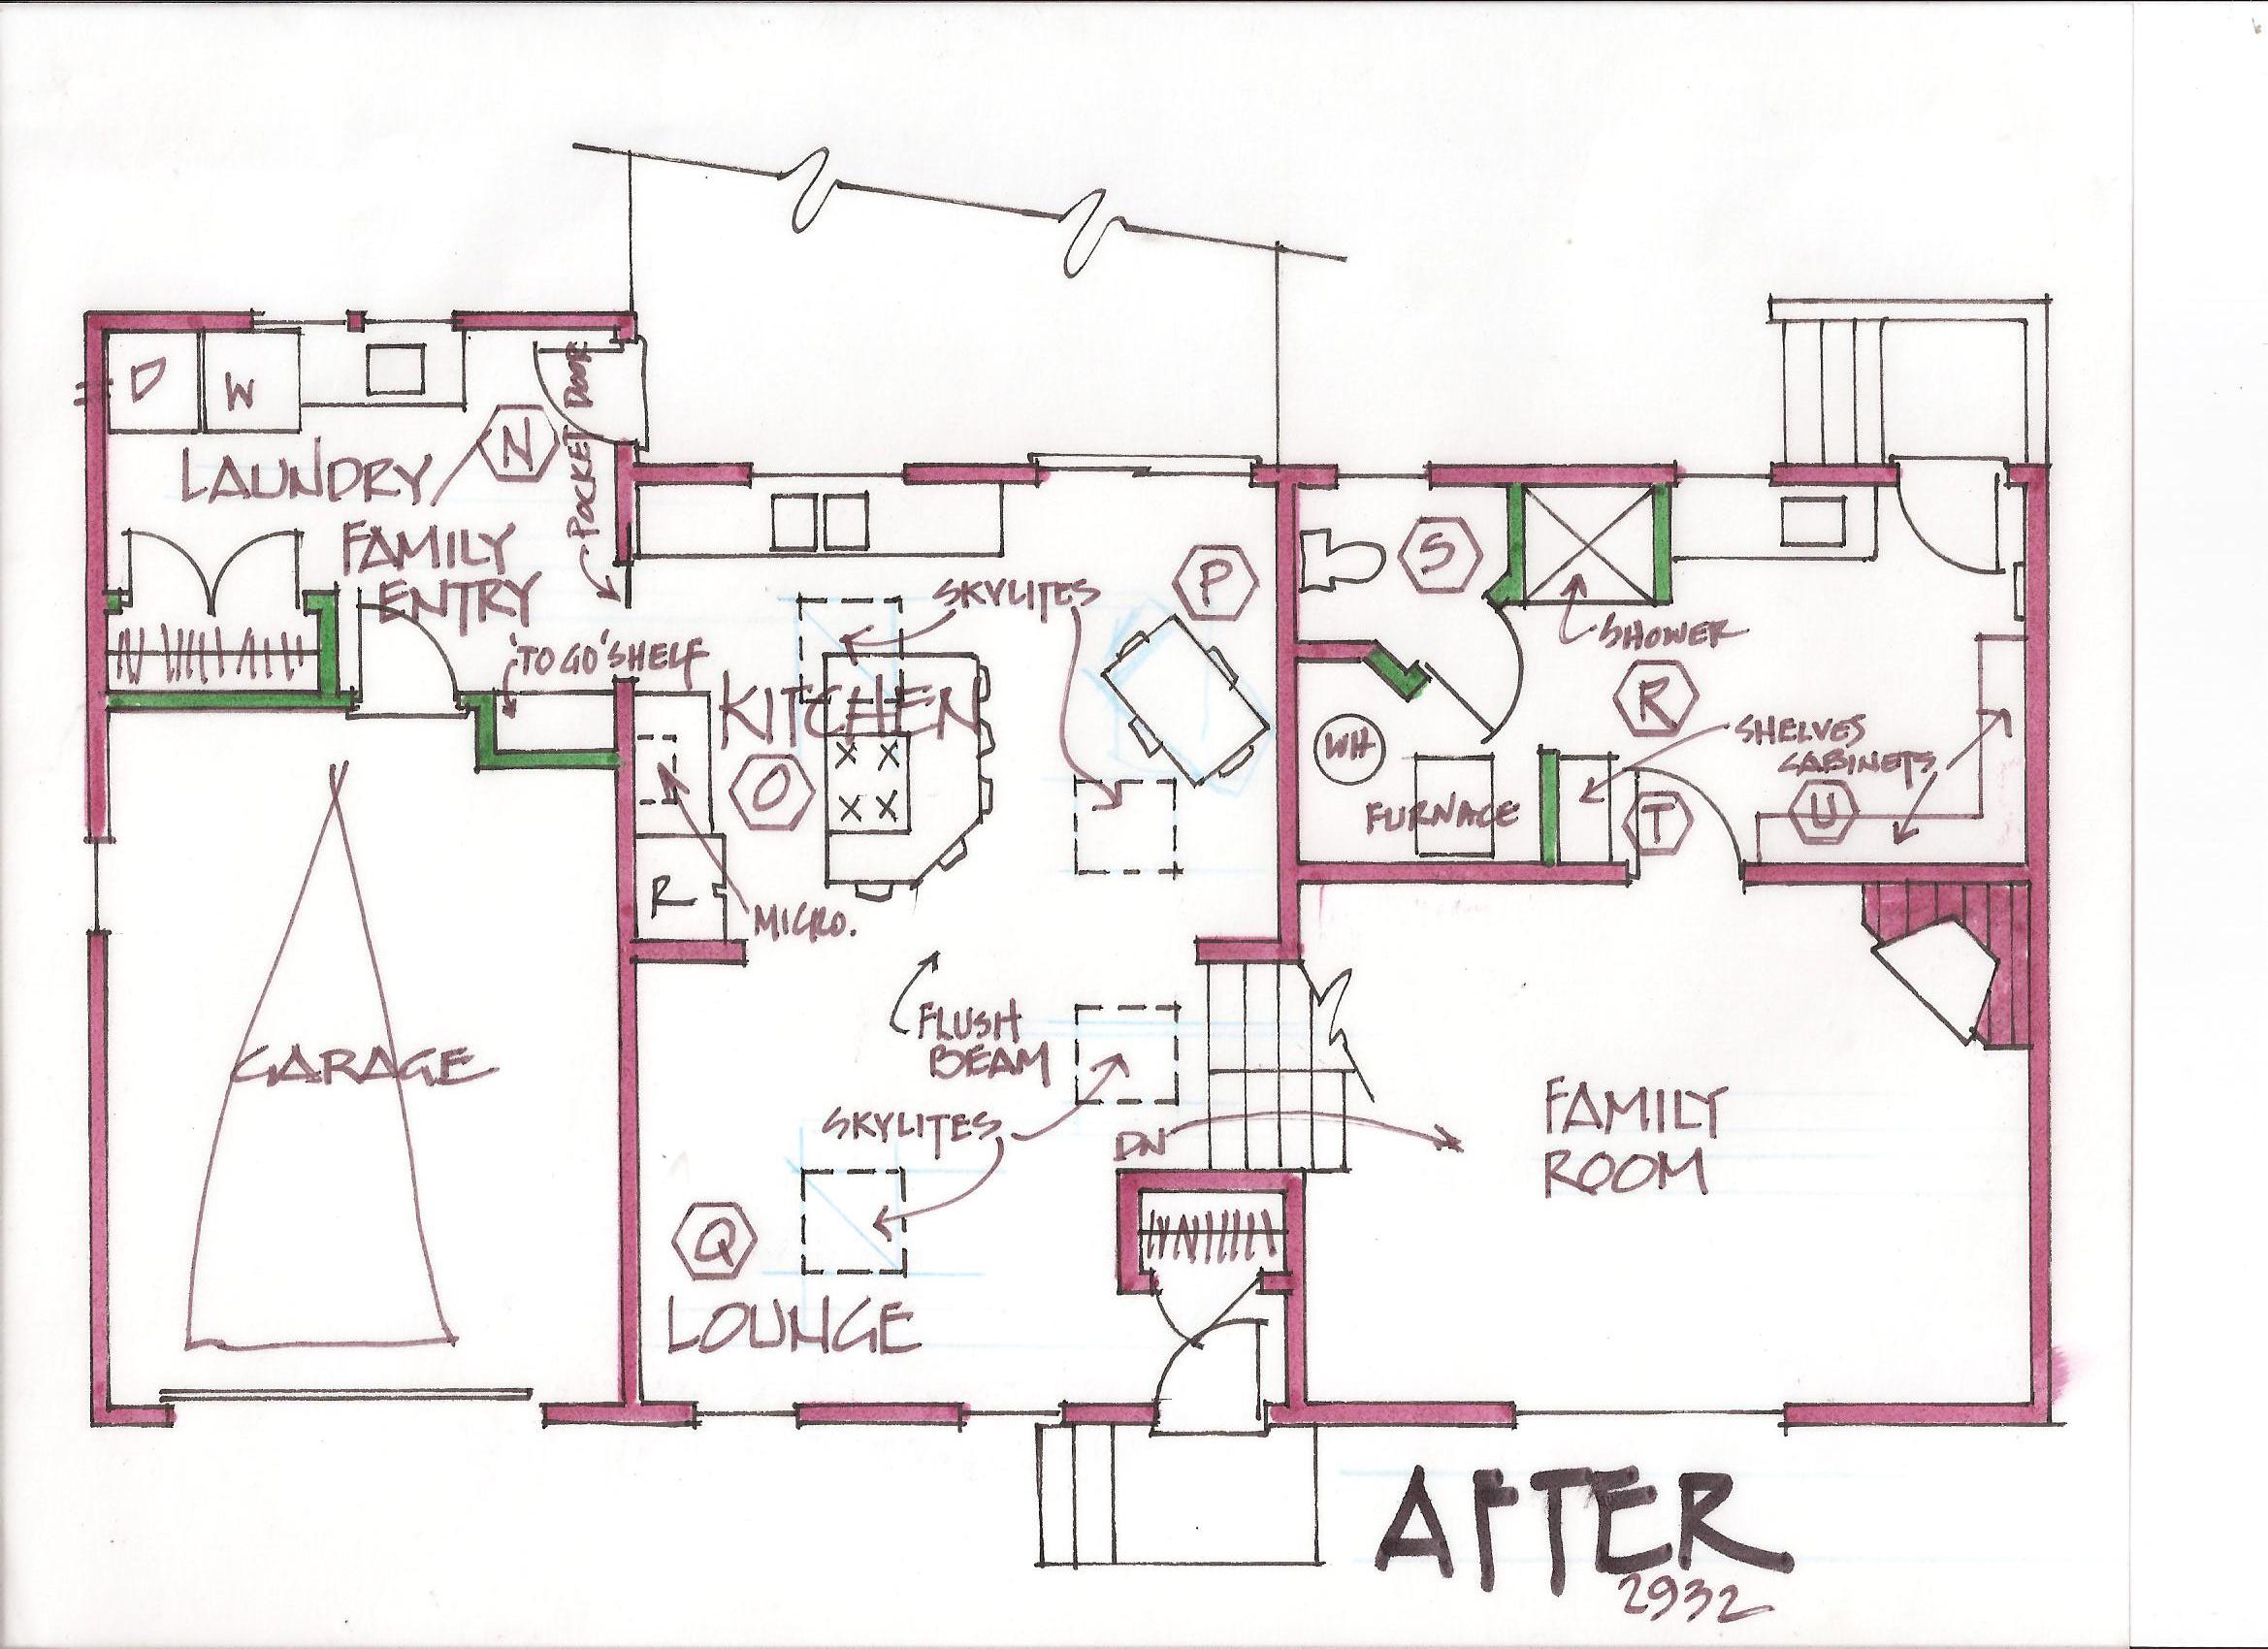 taking on the challenges of remodeling split level homes split level kitchen remodel spaces after